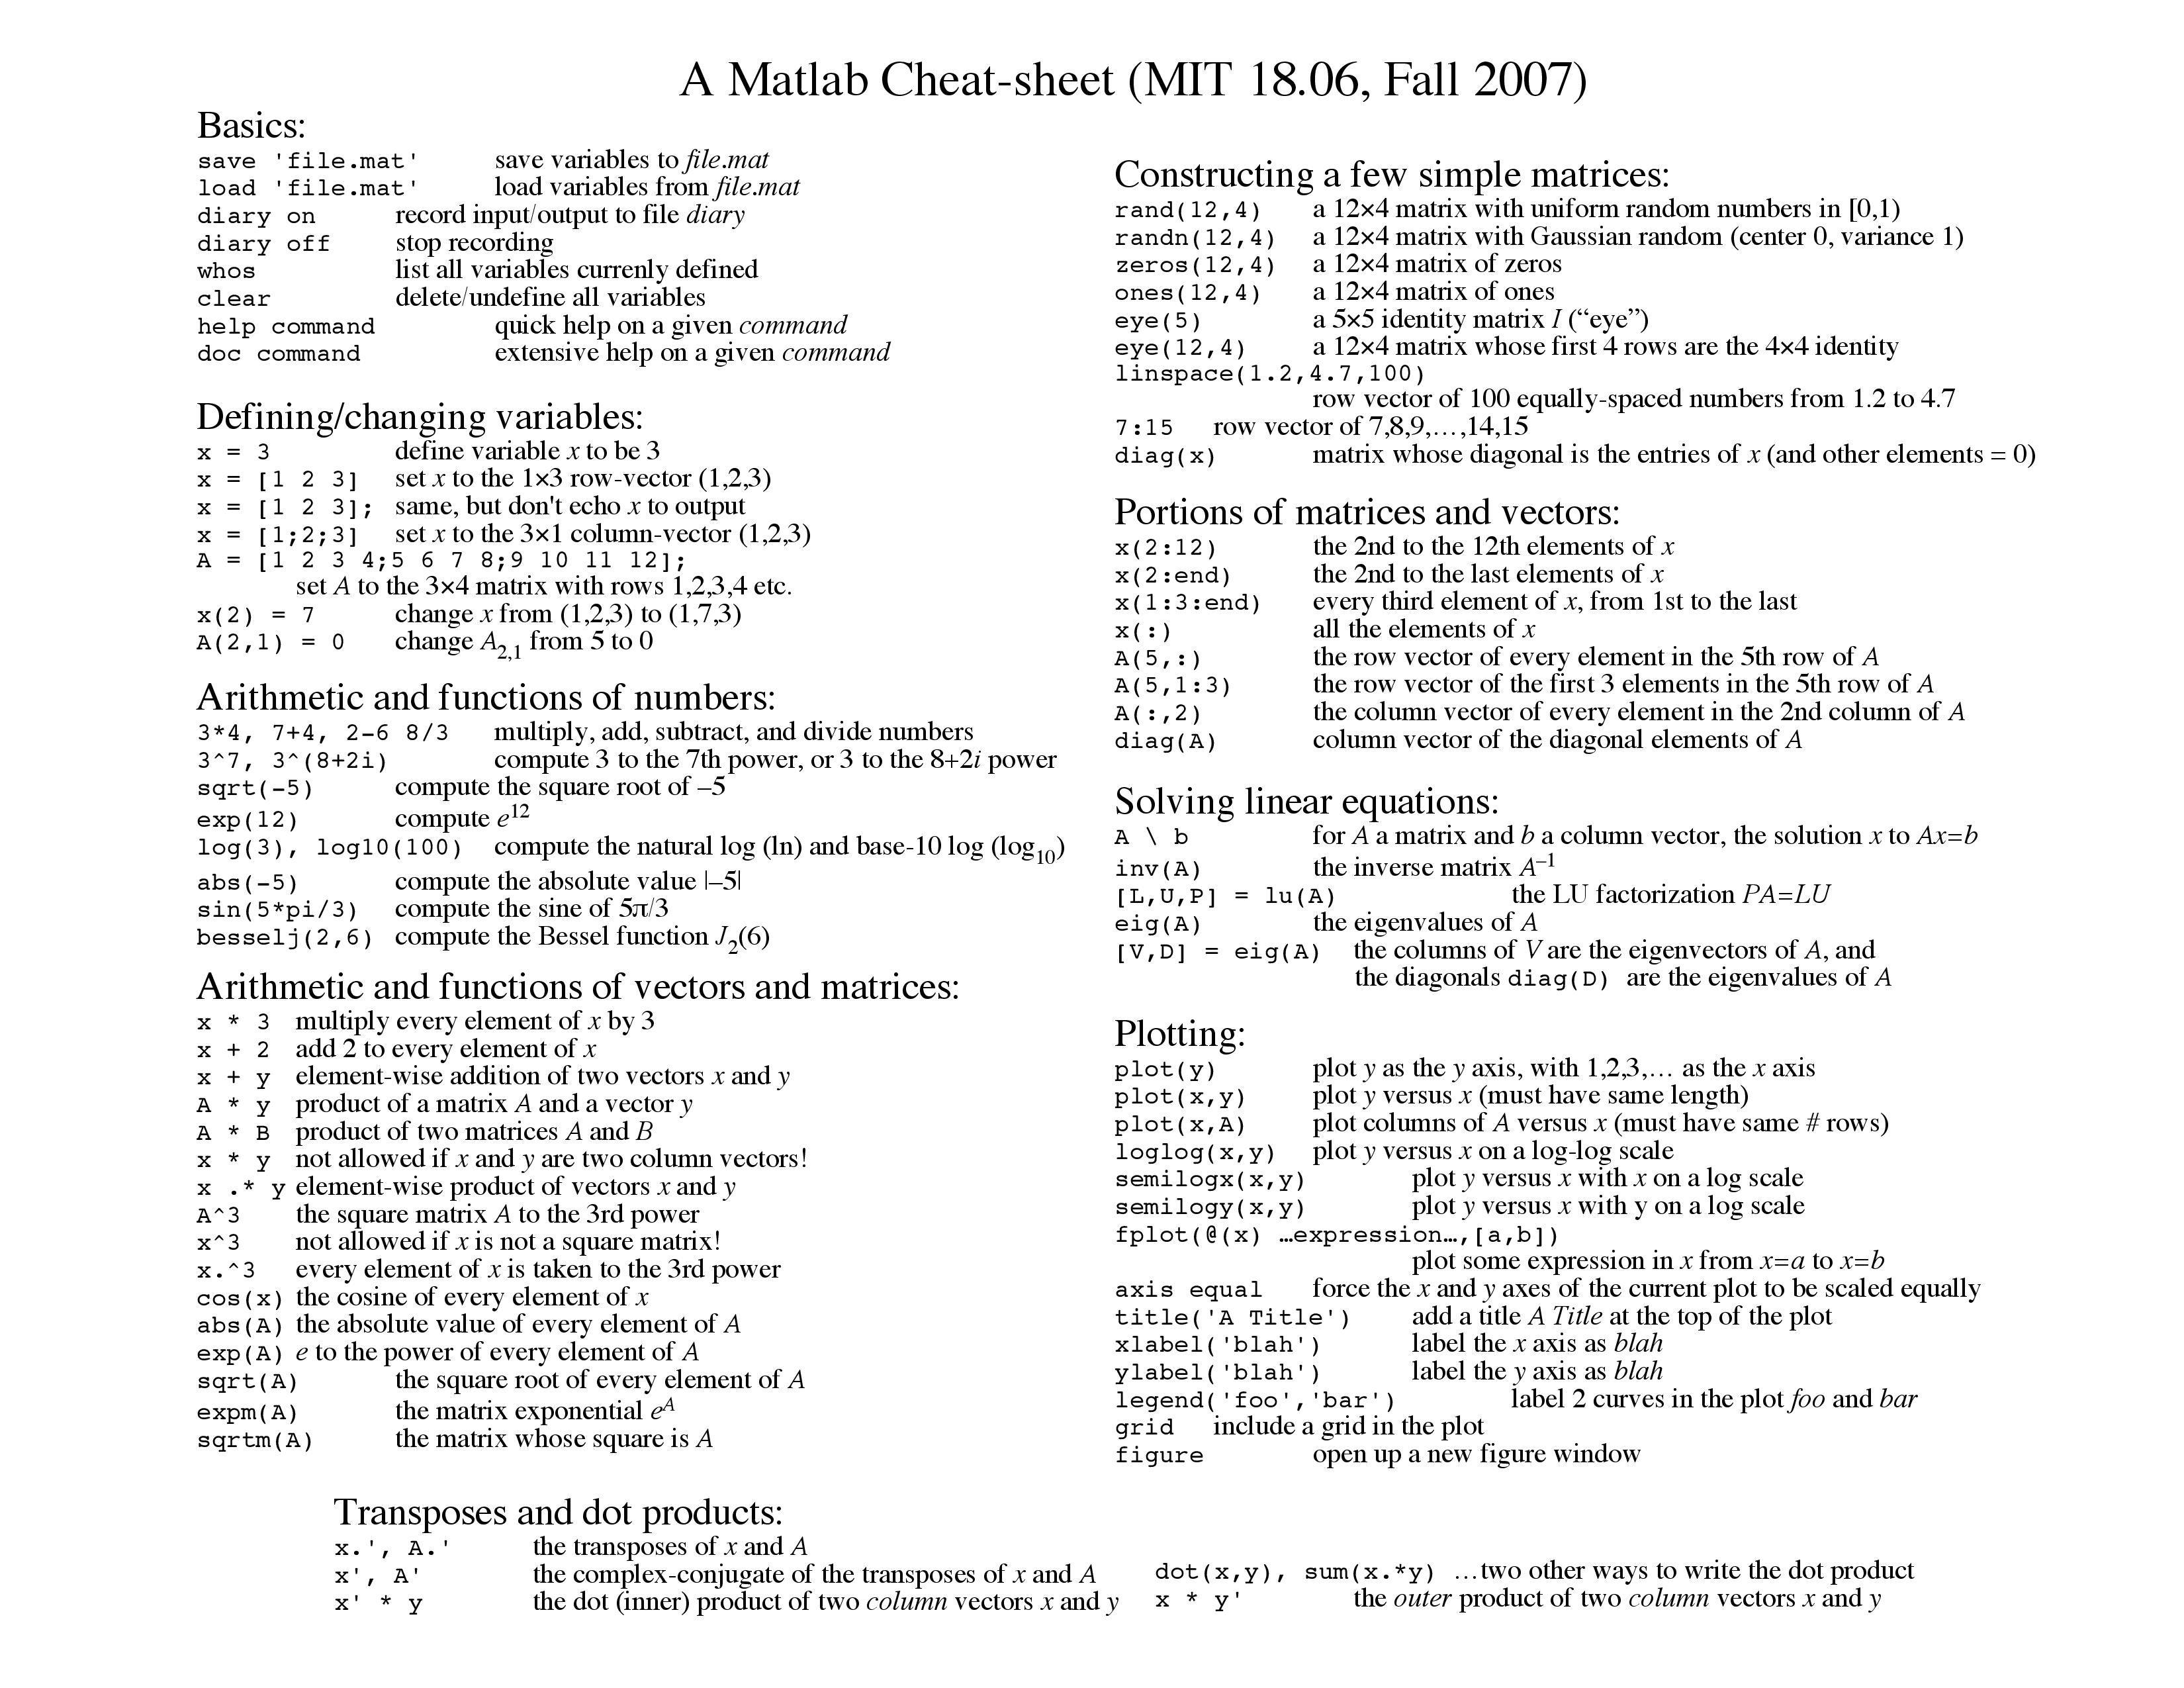 Matlab Cheat Sheet 2 | knowledge in 2019 | Fun math, Fun math games